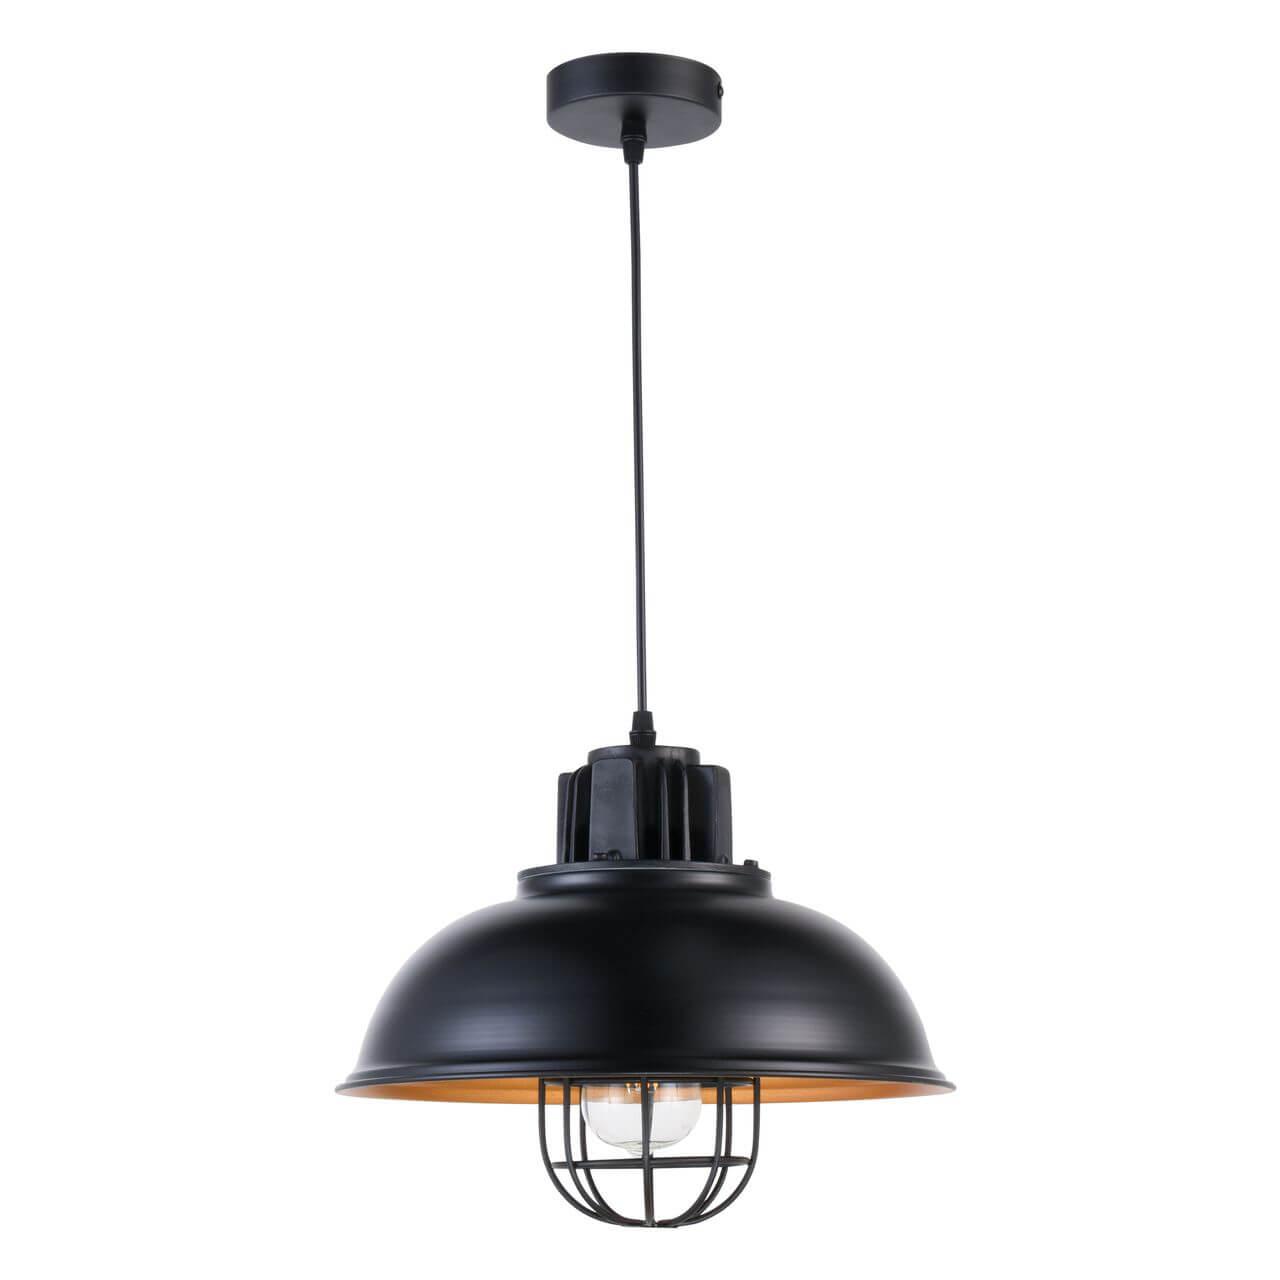 Светильник подвесной FAMETTO DLC V304 E27 Bl